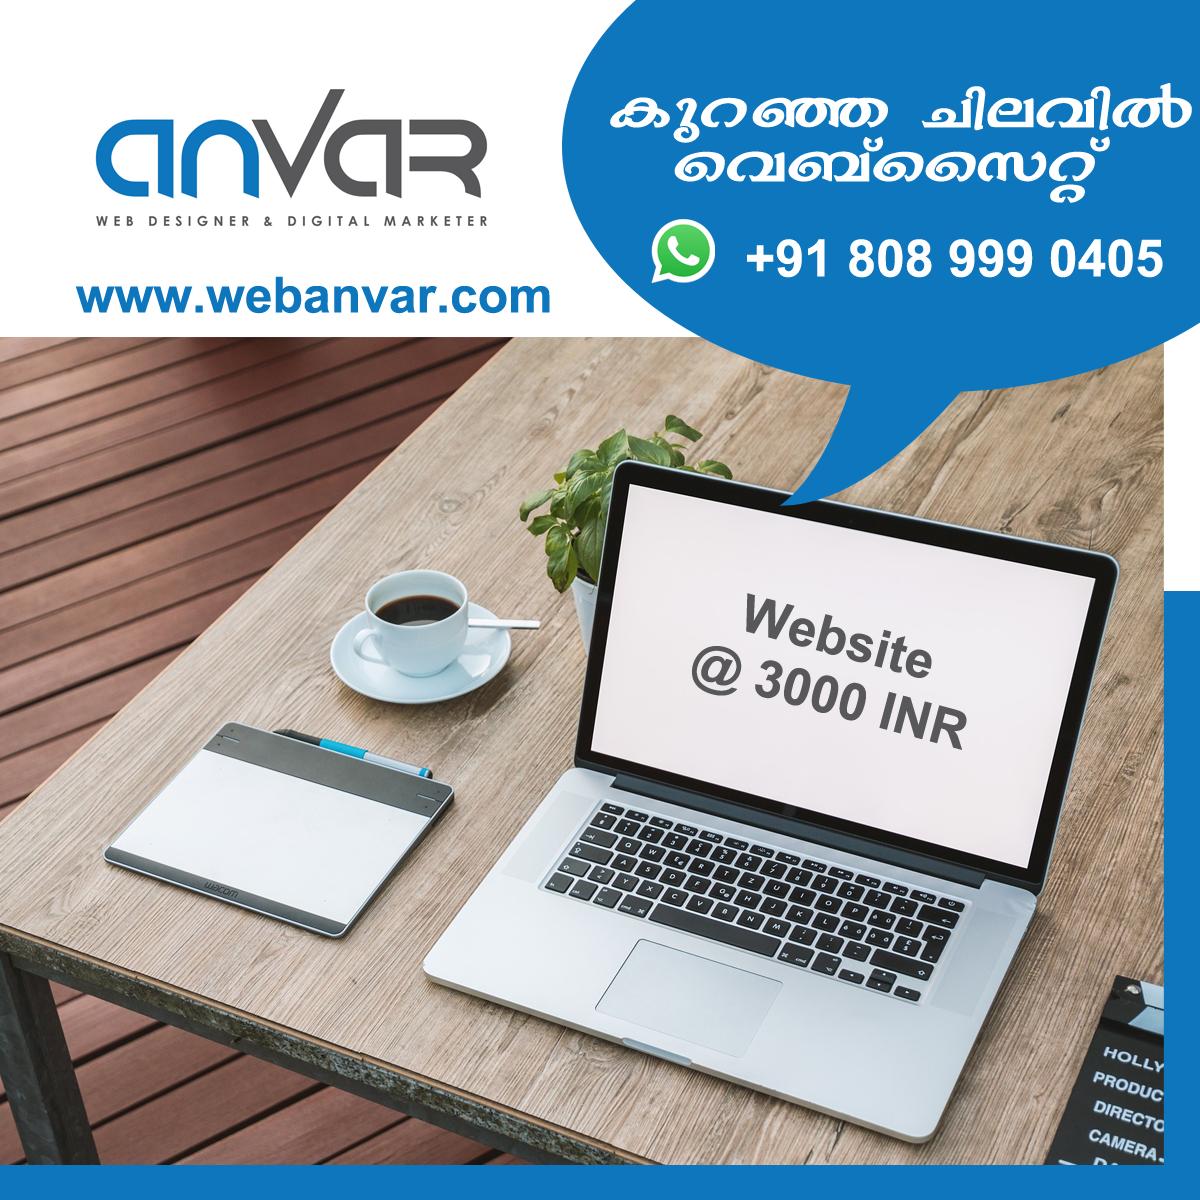 Anvar Freelance Web Designer Kerala and SEO Expert Calicut